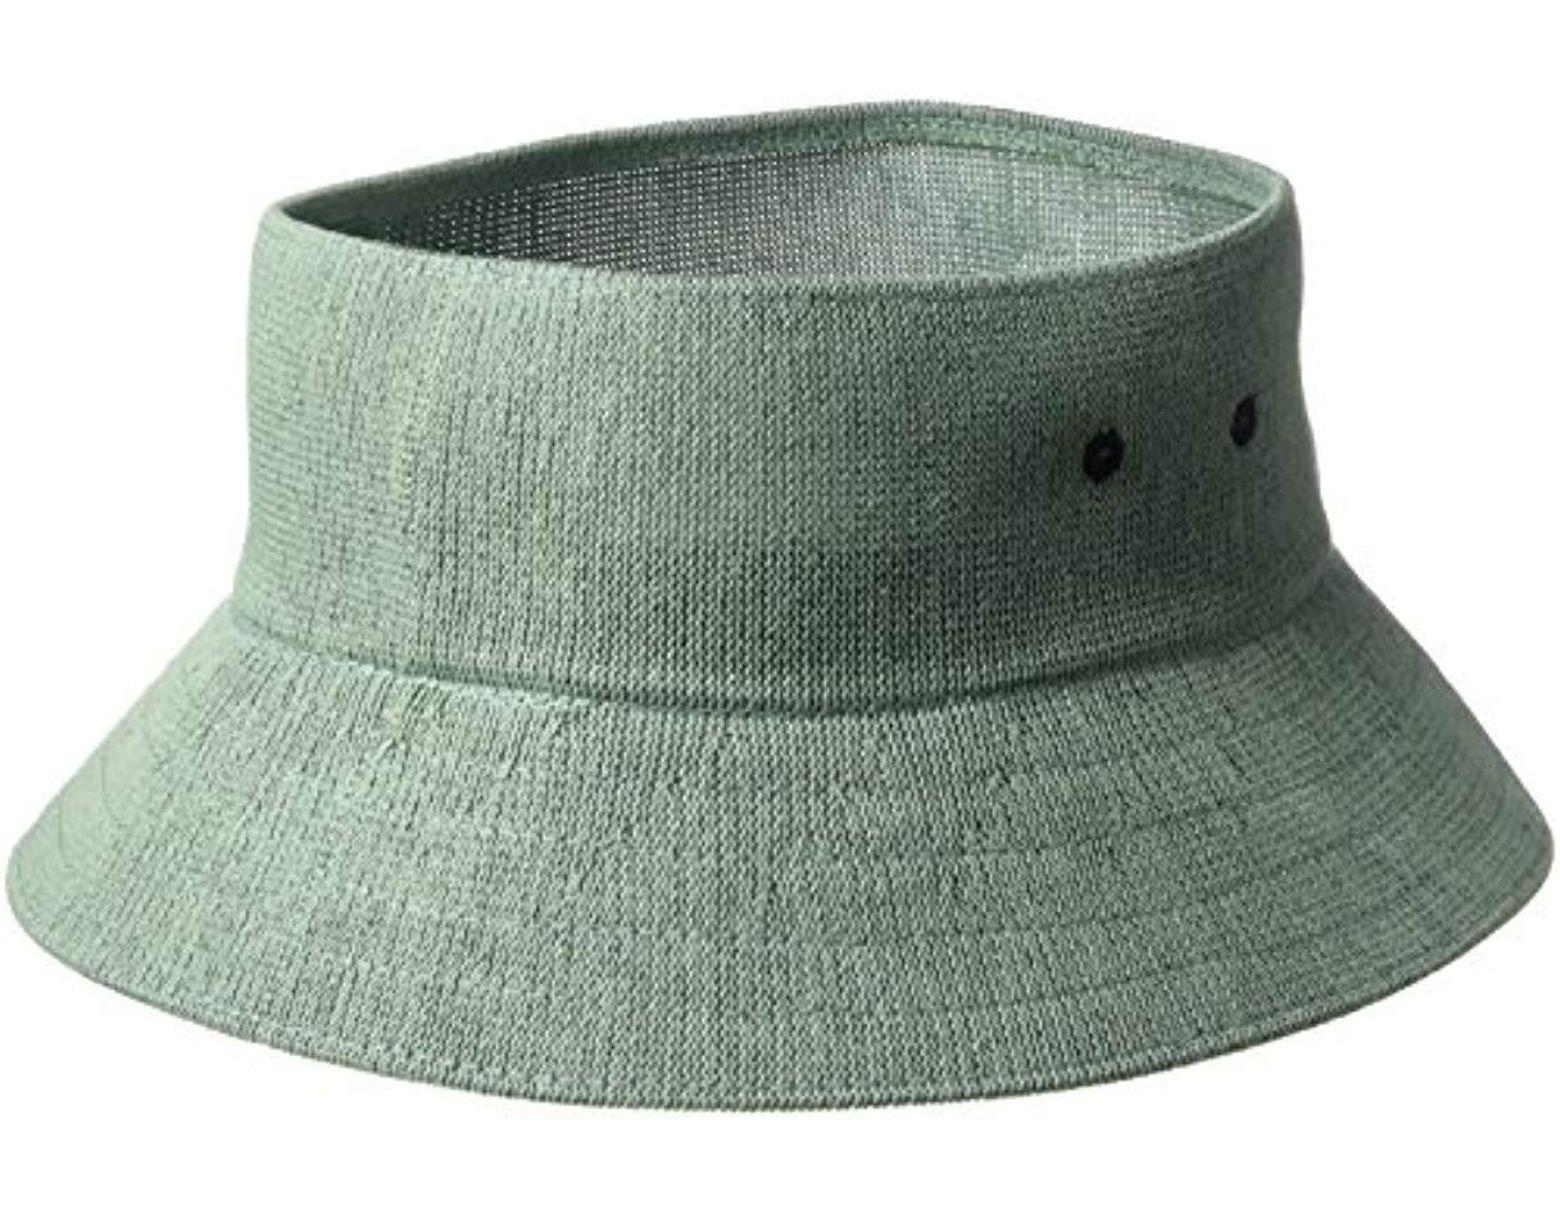 610212501 Men's Green Bamboo Cut Off Bucket Hat Visor